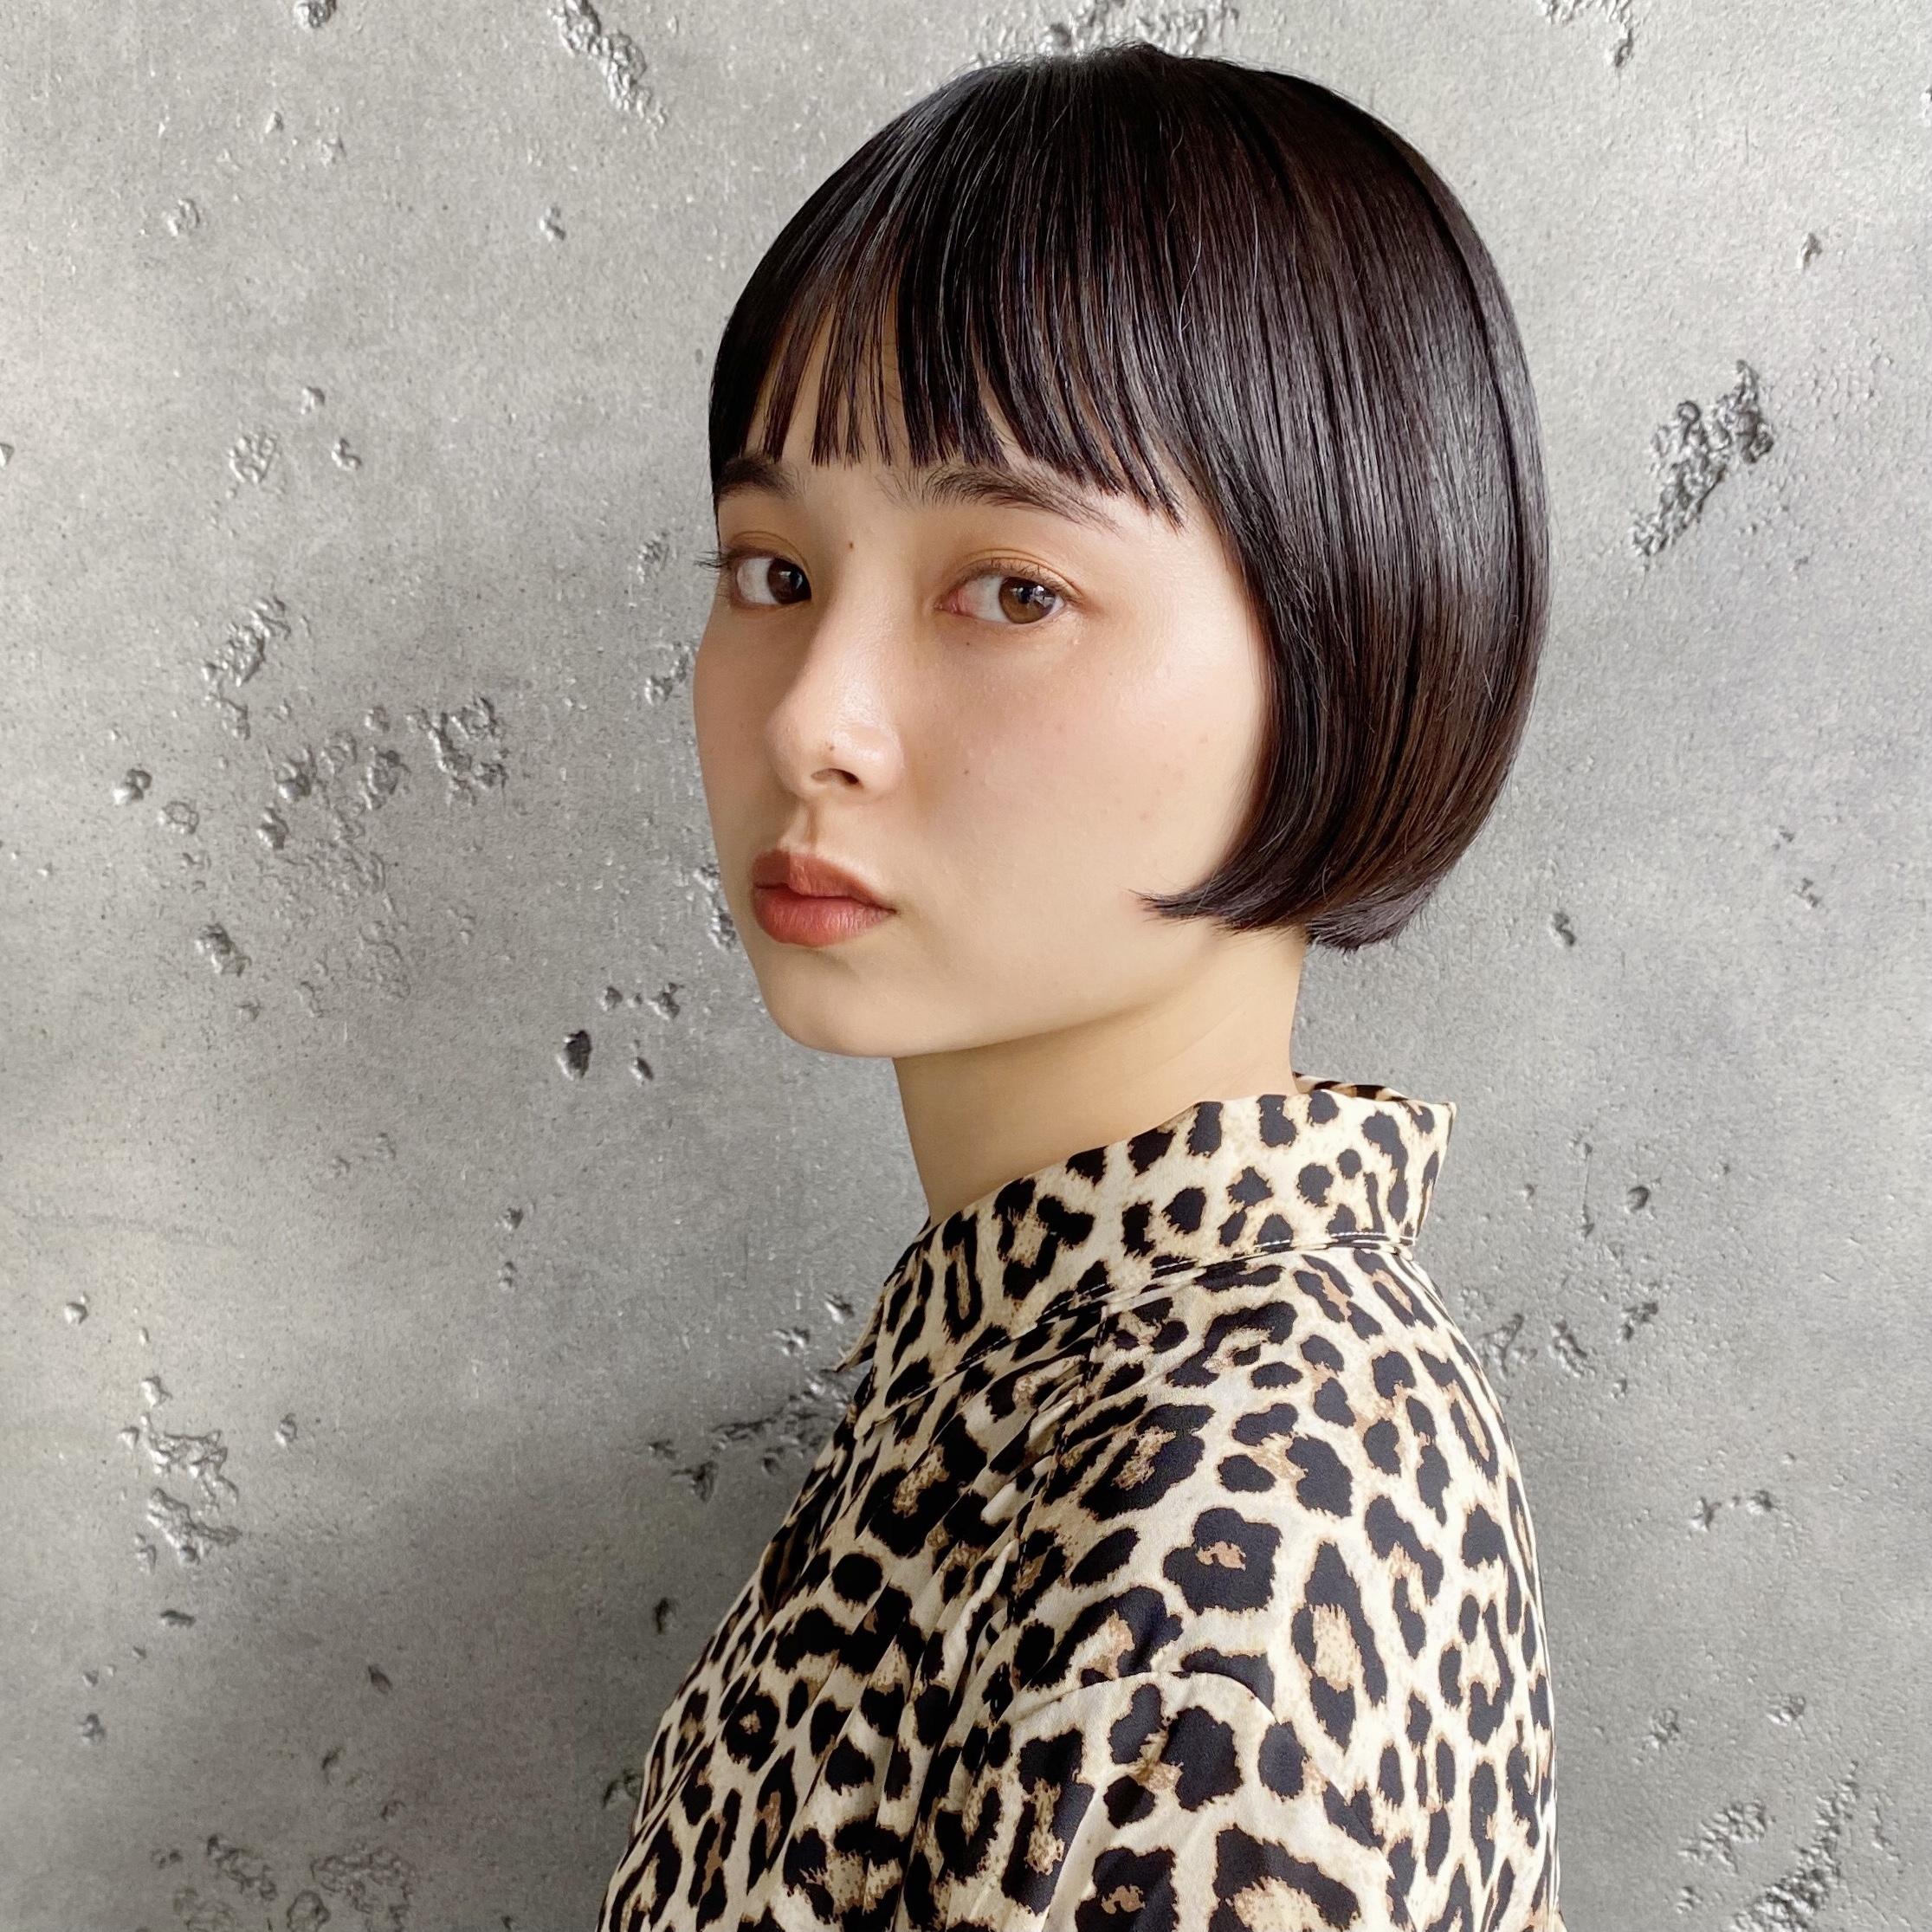 style-062